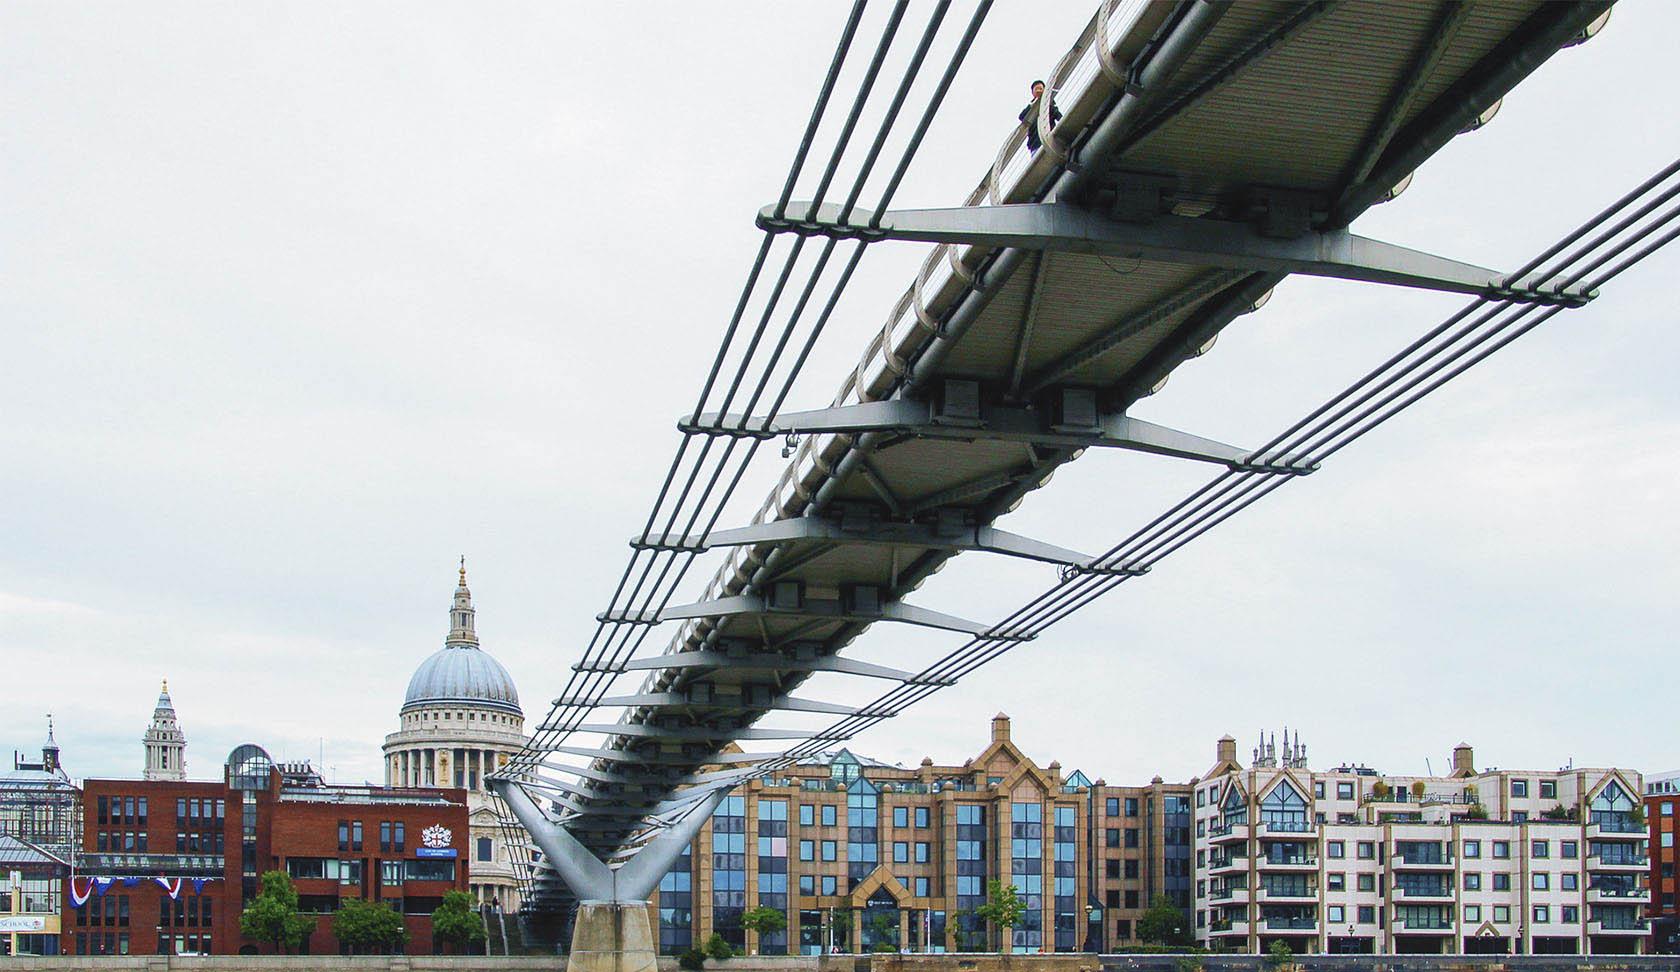 London Millennium Bridge, England